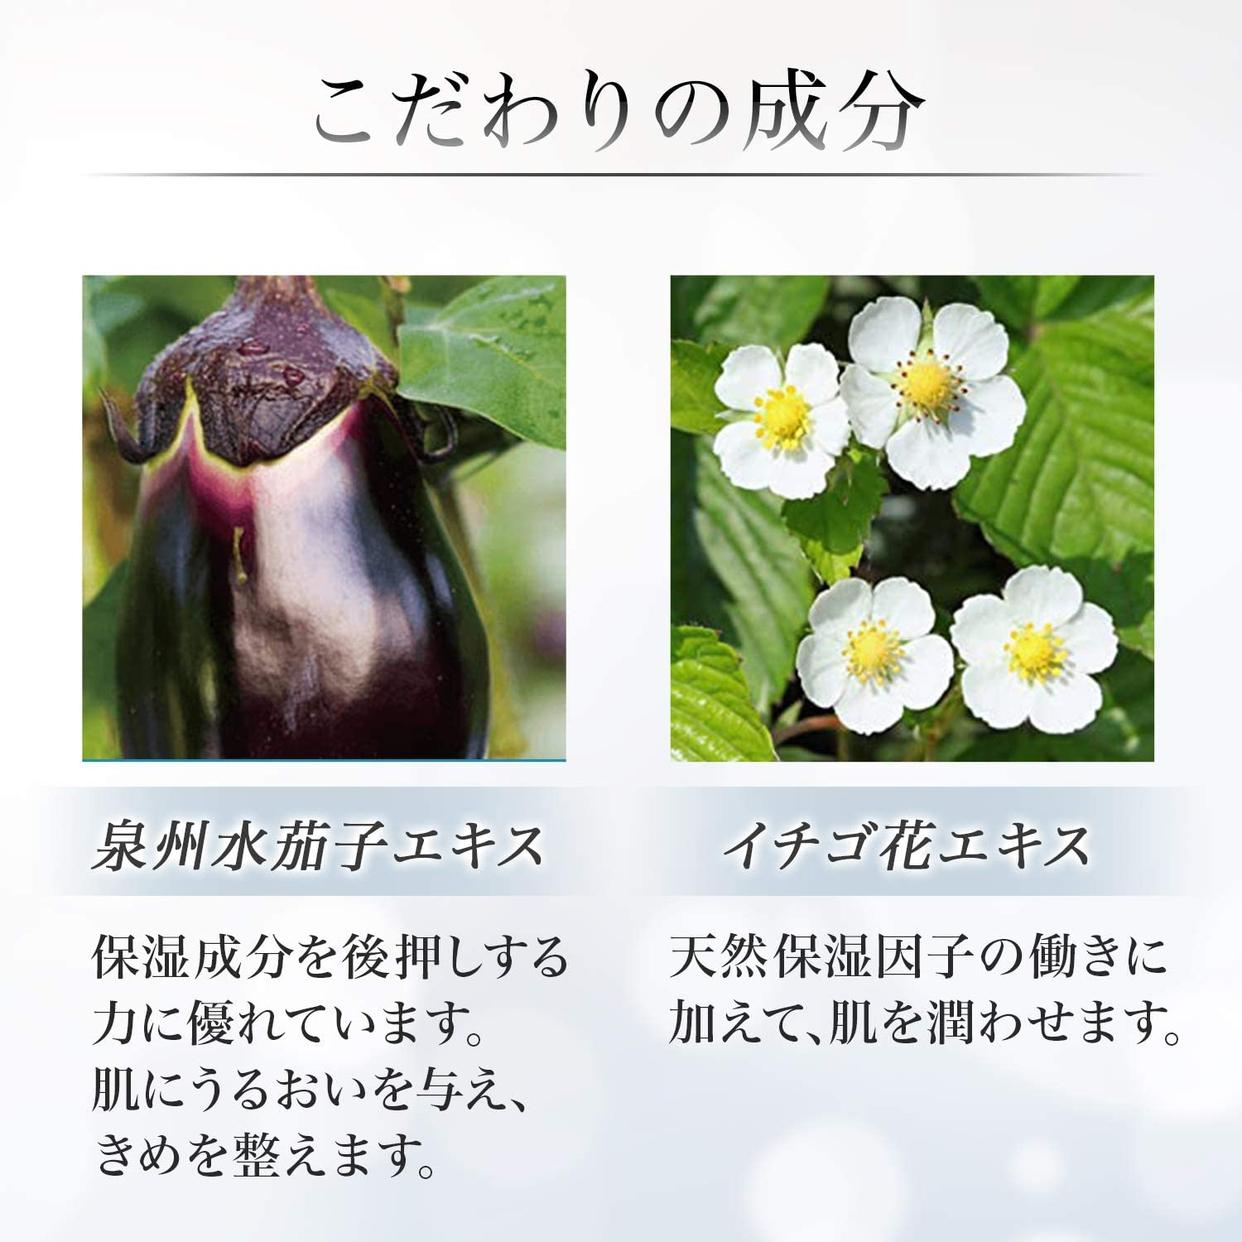 Domohorn Wrinkle(ドモホルンリンクル) 保湿液の商品画像6